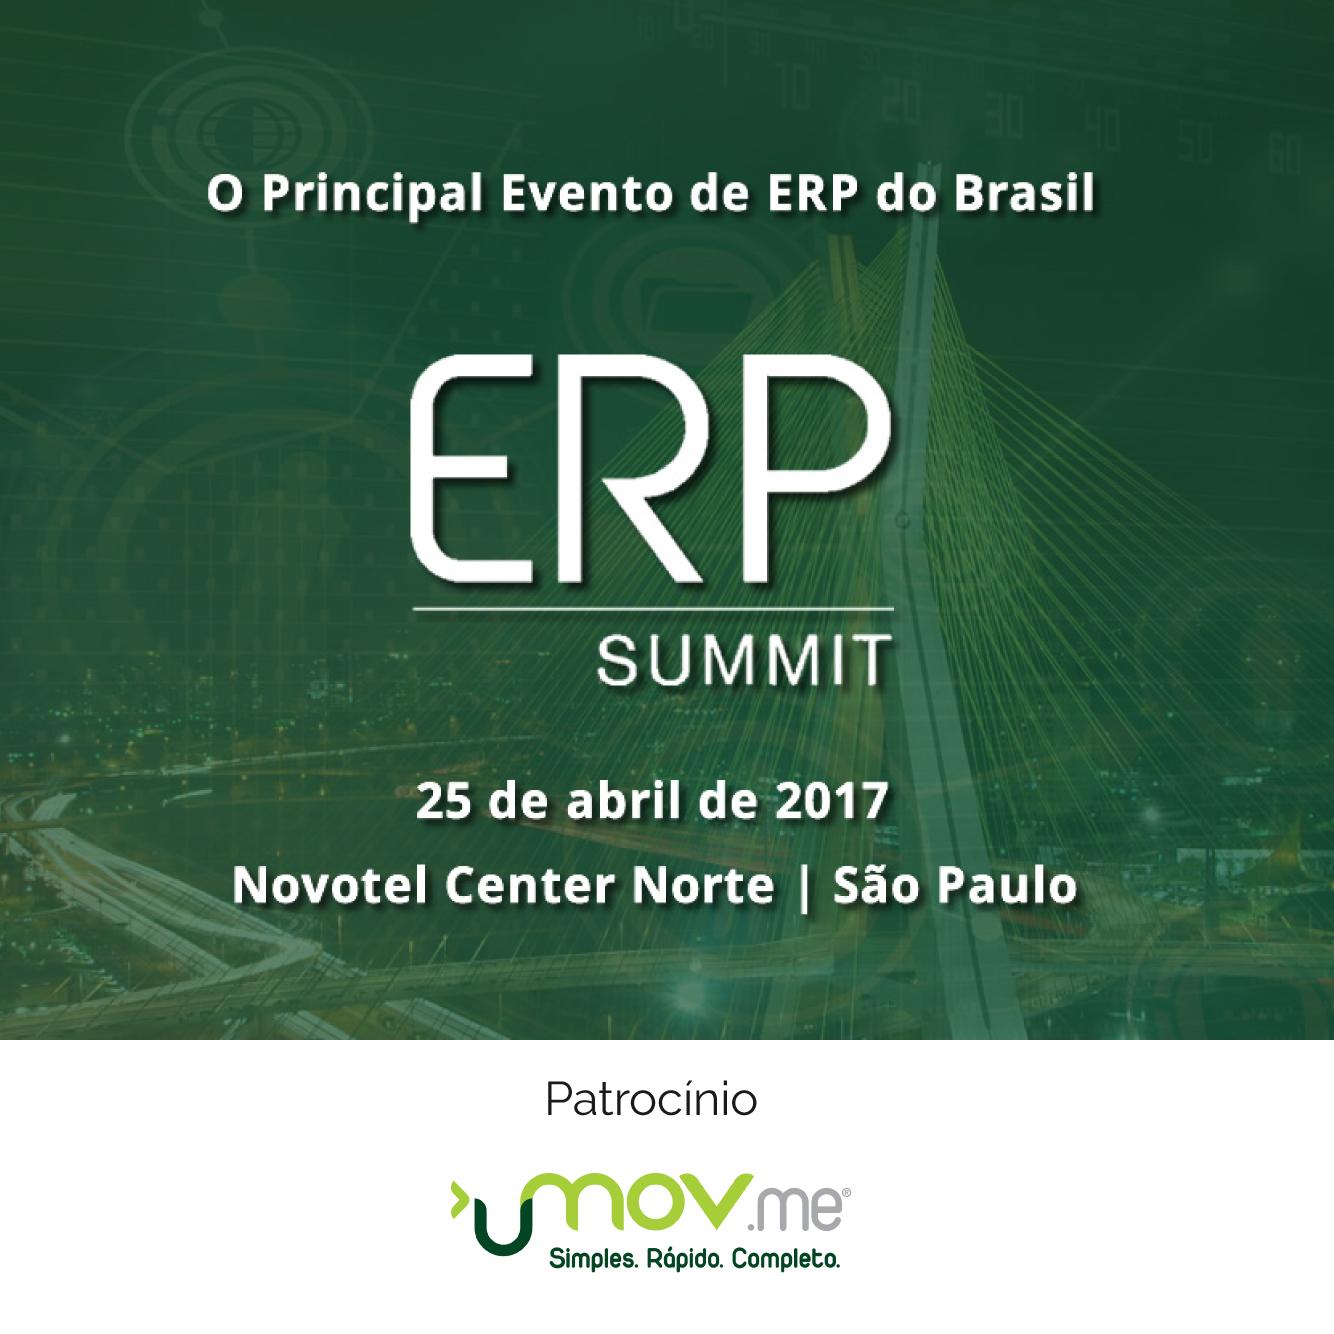 Logo da ERP Summit 2017 - Patrocinada pela Umov.me